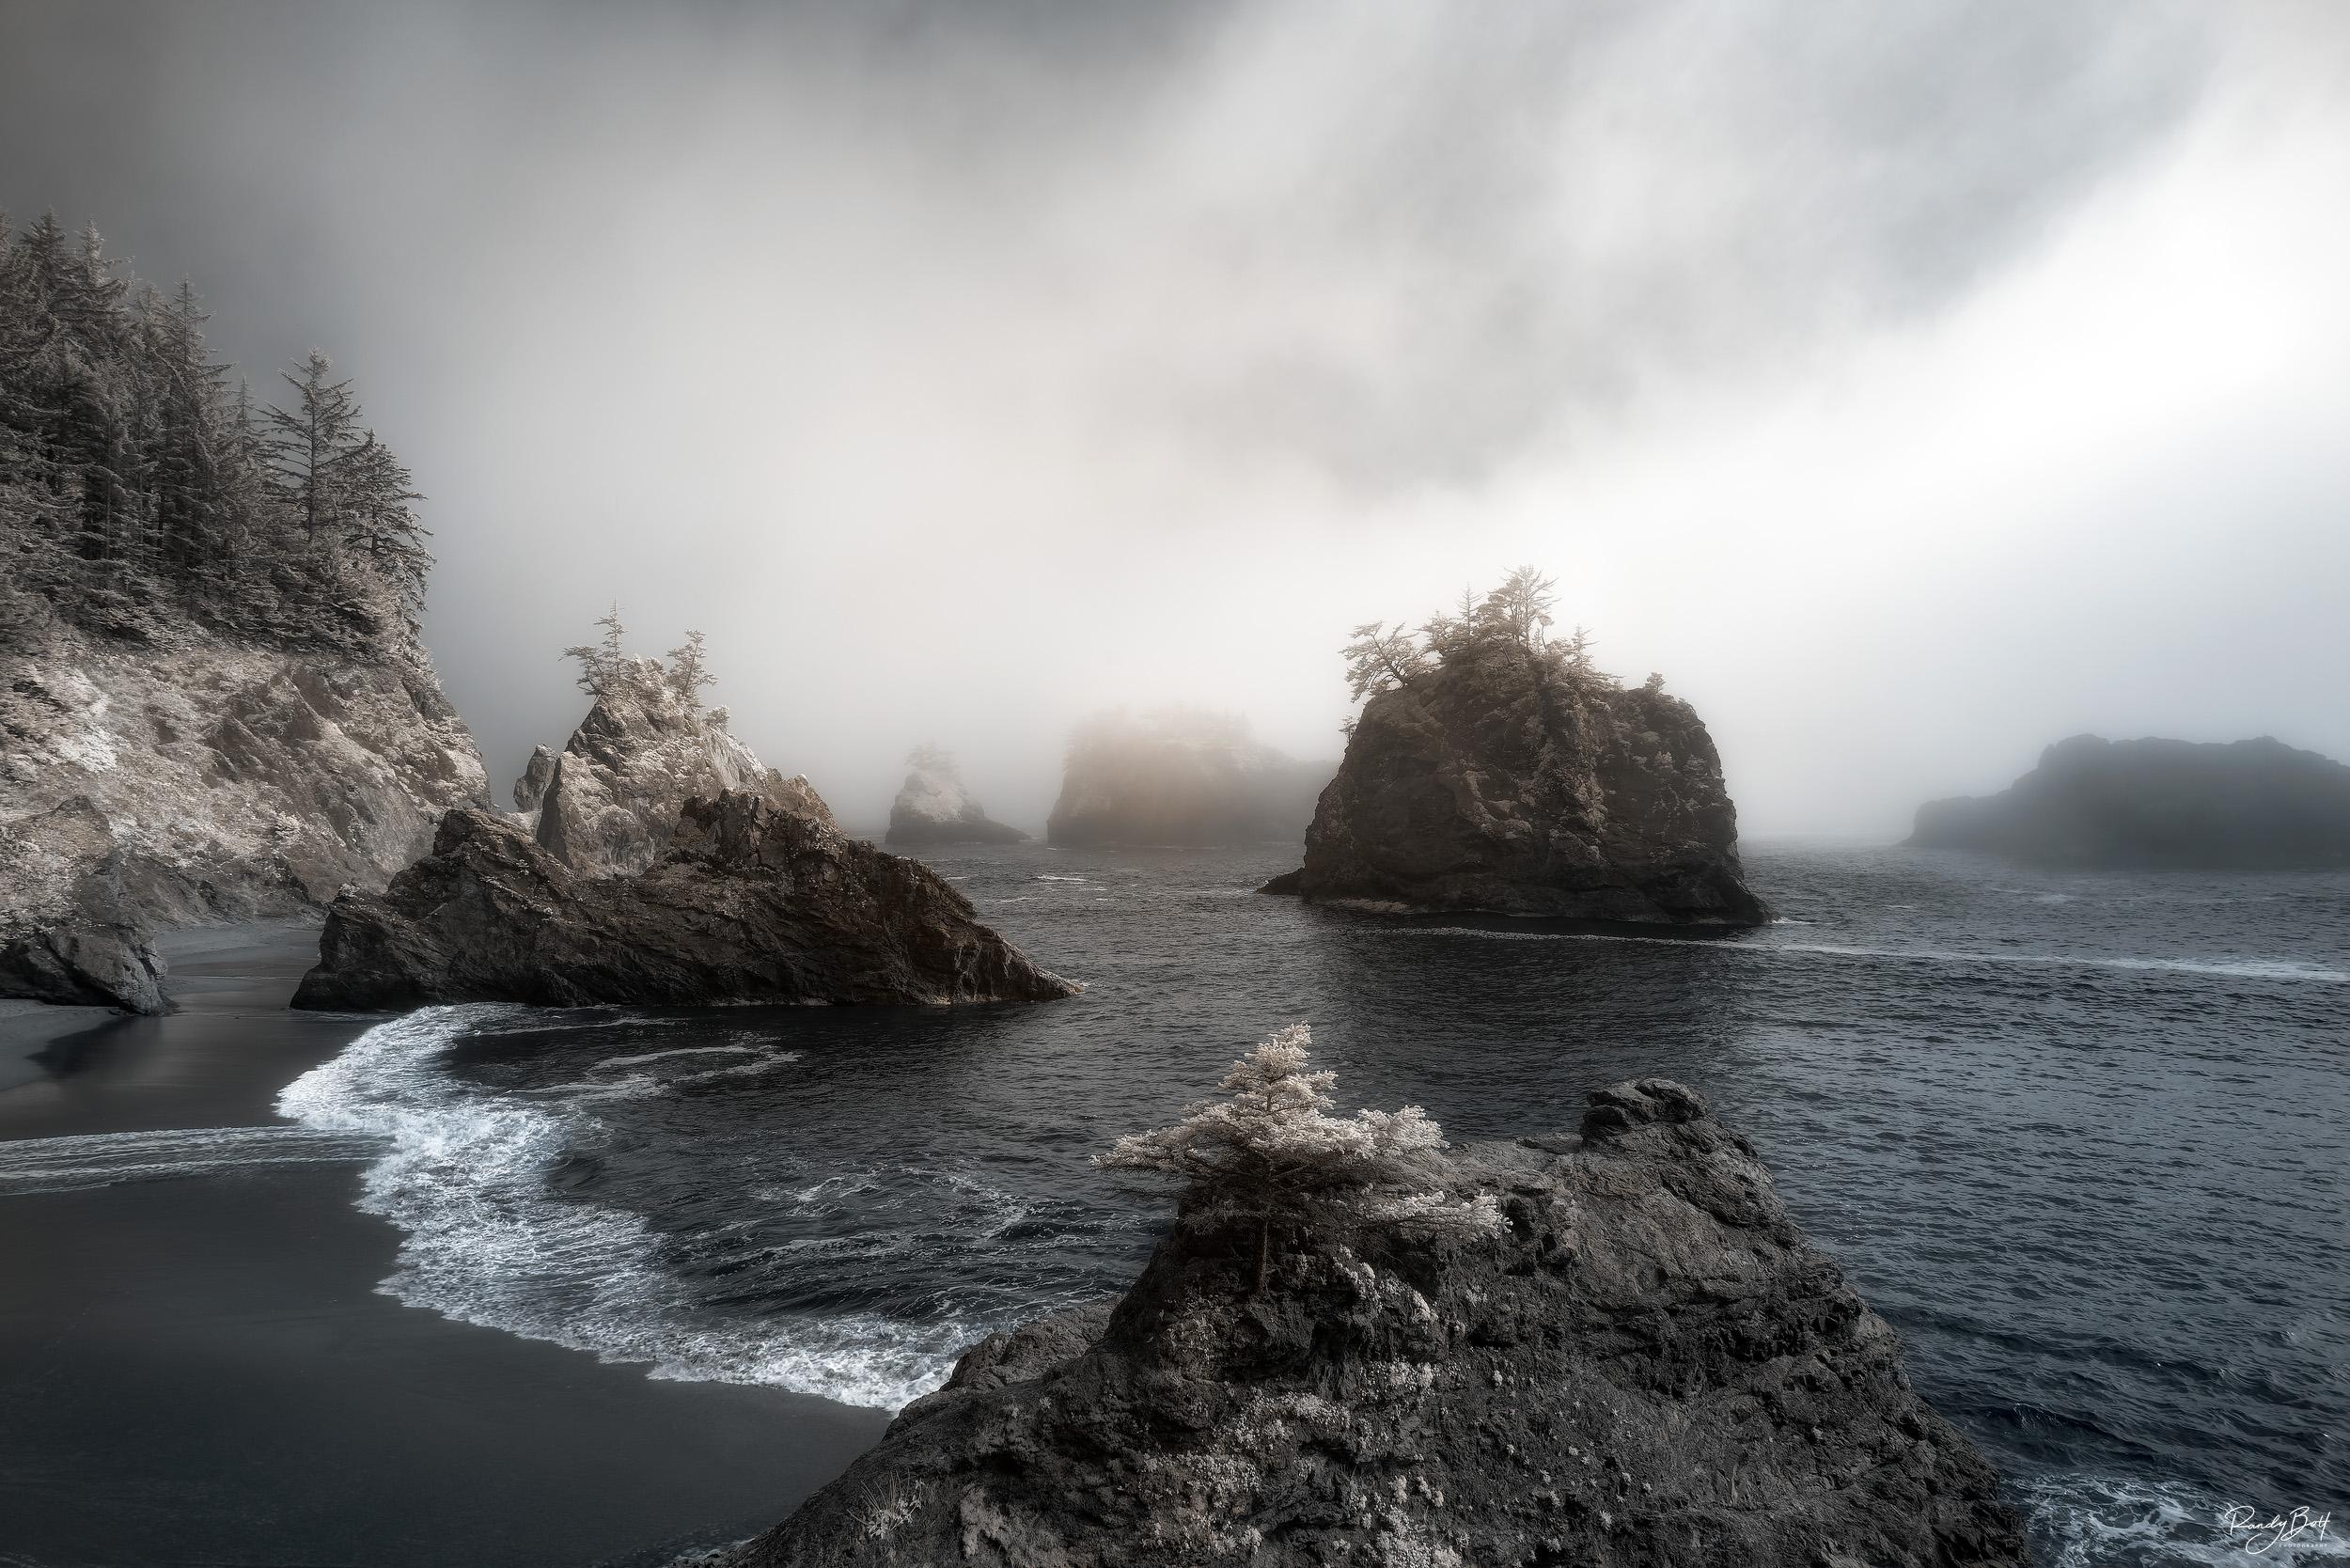 secret beach in standard infrared on the Oregon Coast